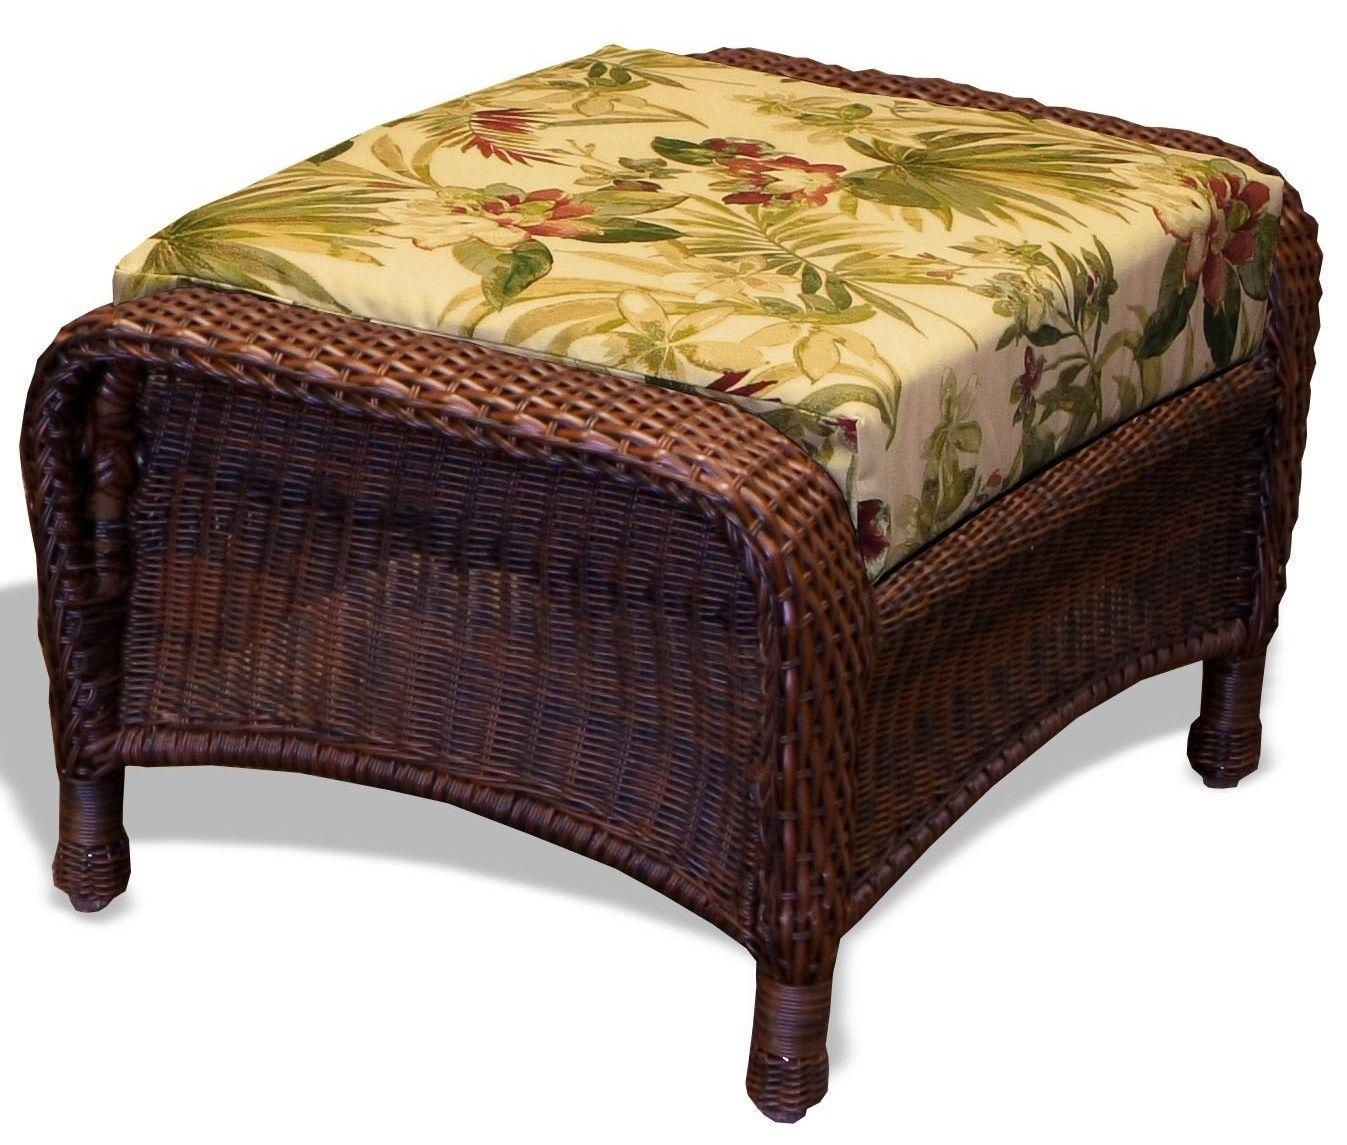 #129 - Outdoor Patio Garden Furniture Java Resin Wicker Ottoman Isadora Parchment